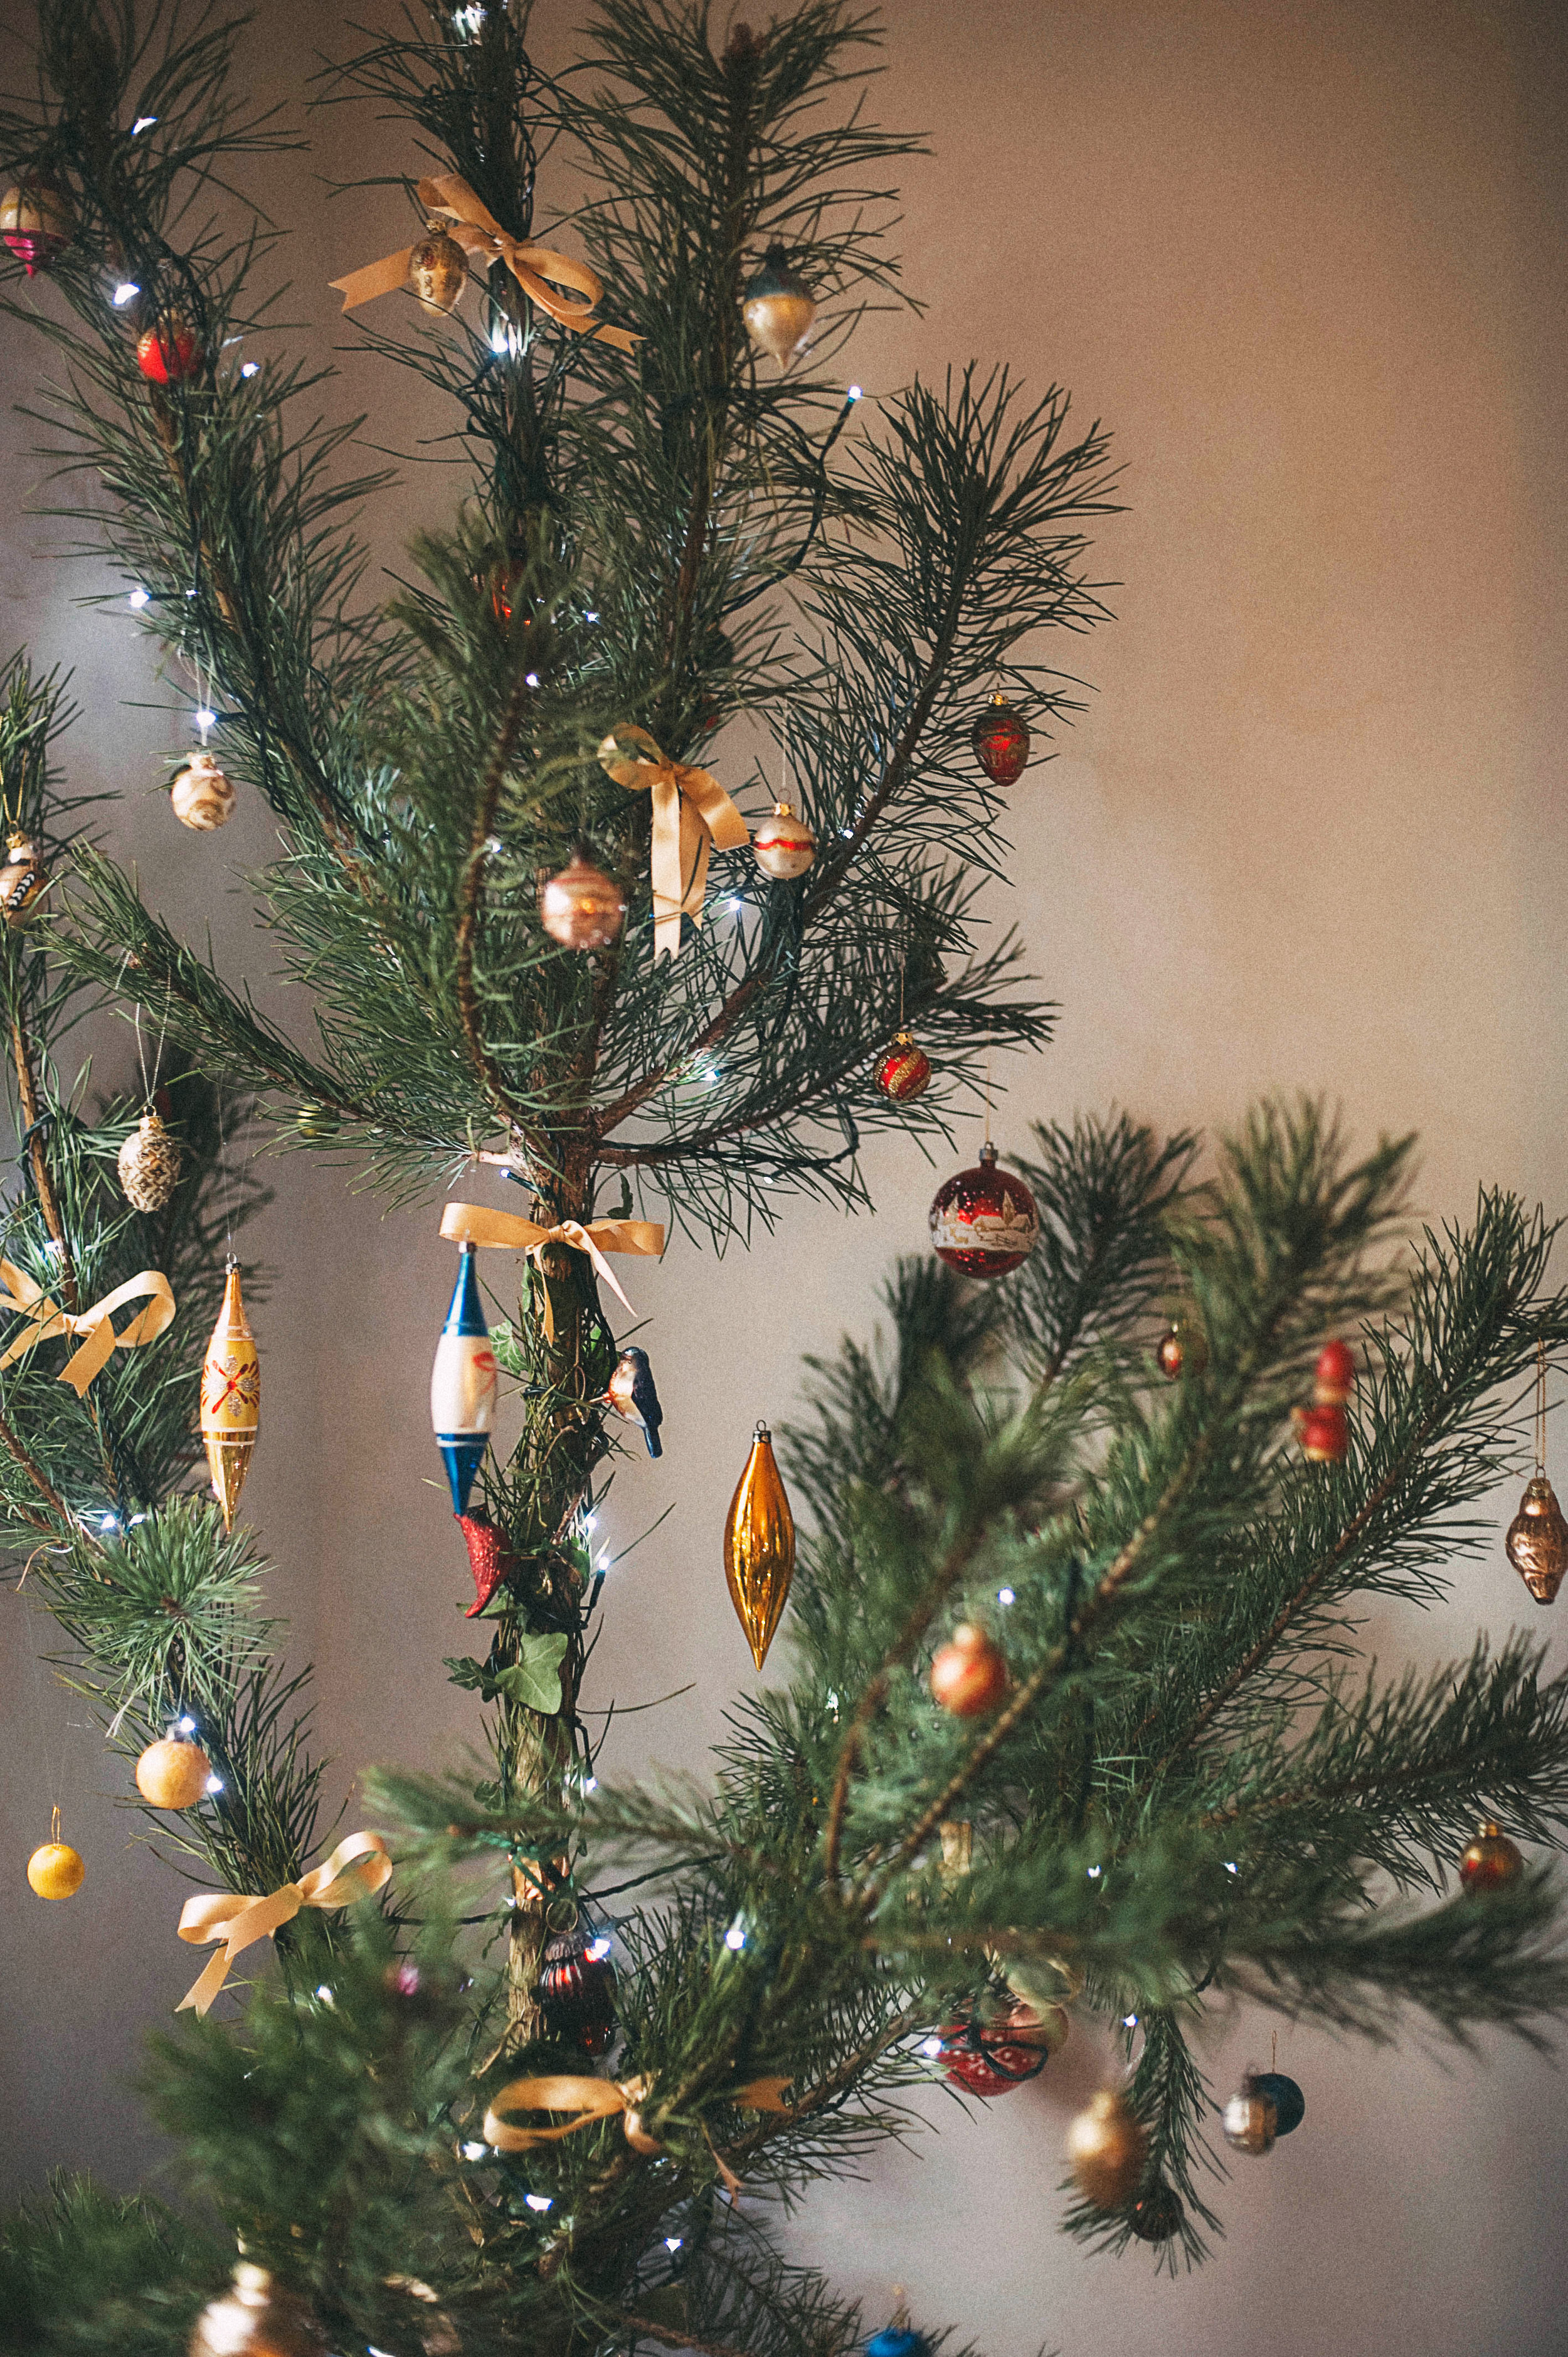 Last years tree captured beautifully by  Lulu